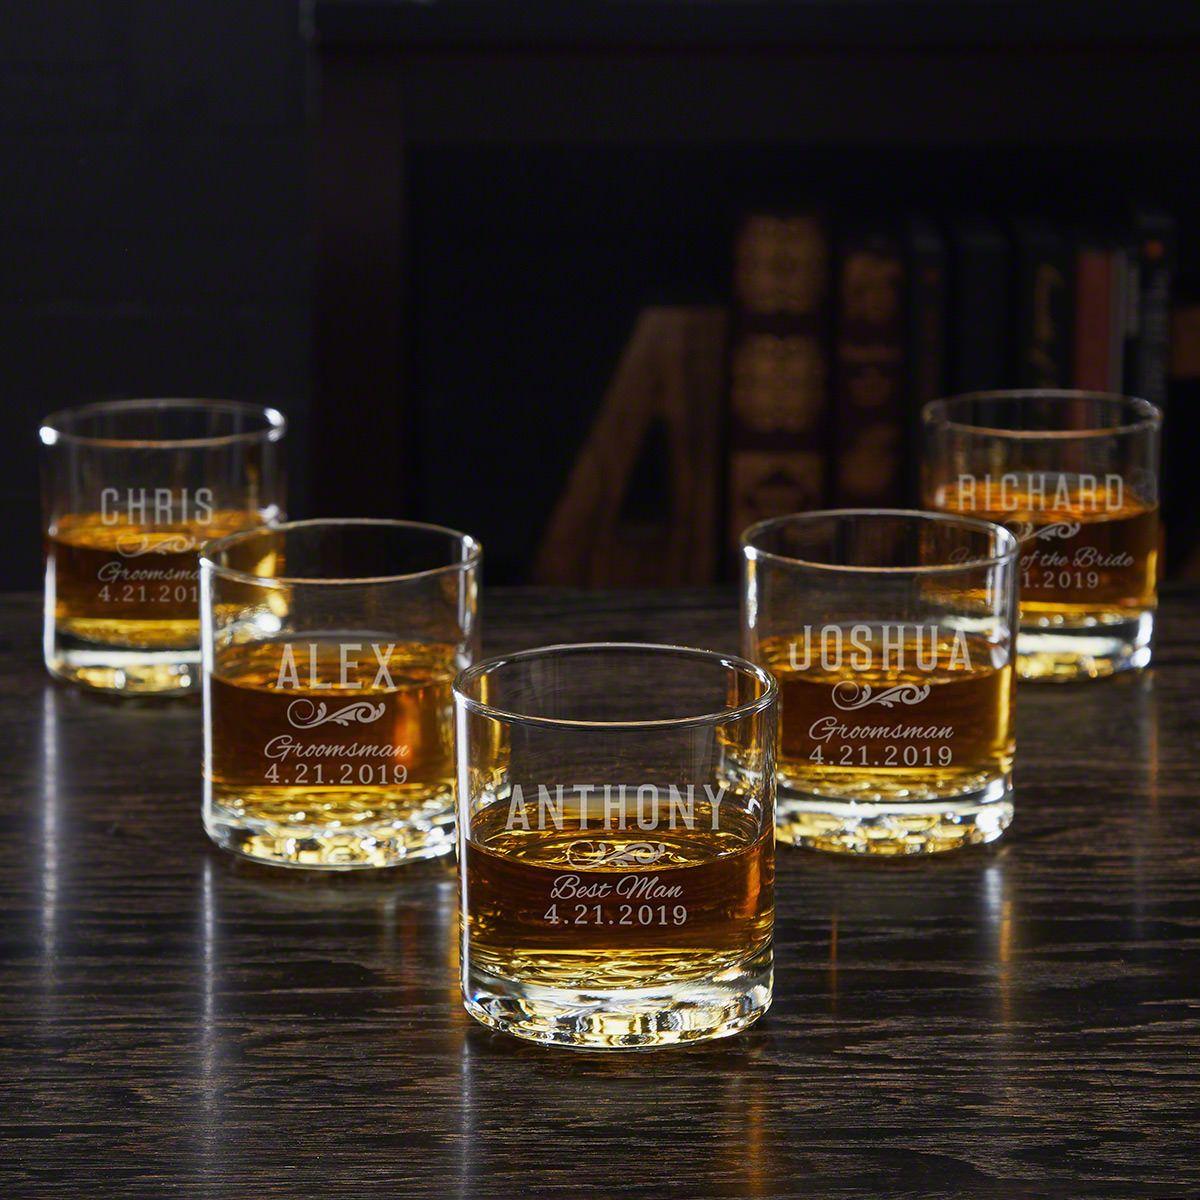 Classic Groomsman Whiskey Glasses Personalized Buckman – Set of 5